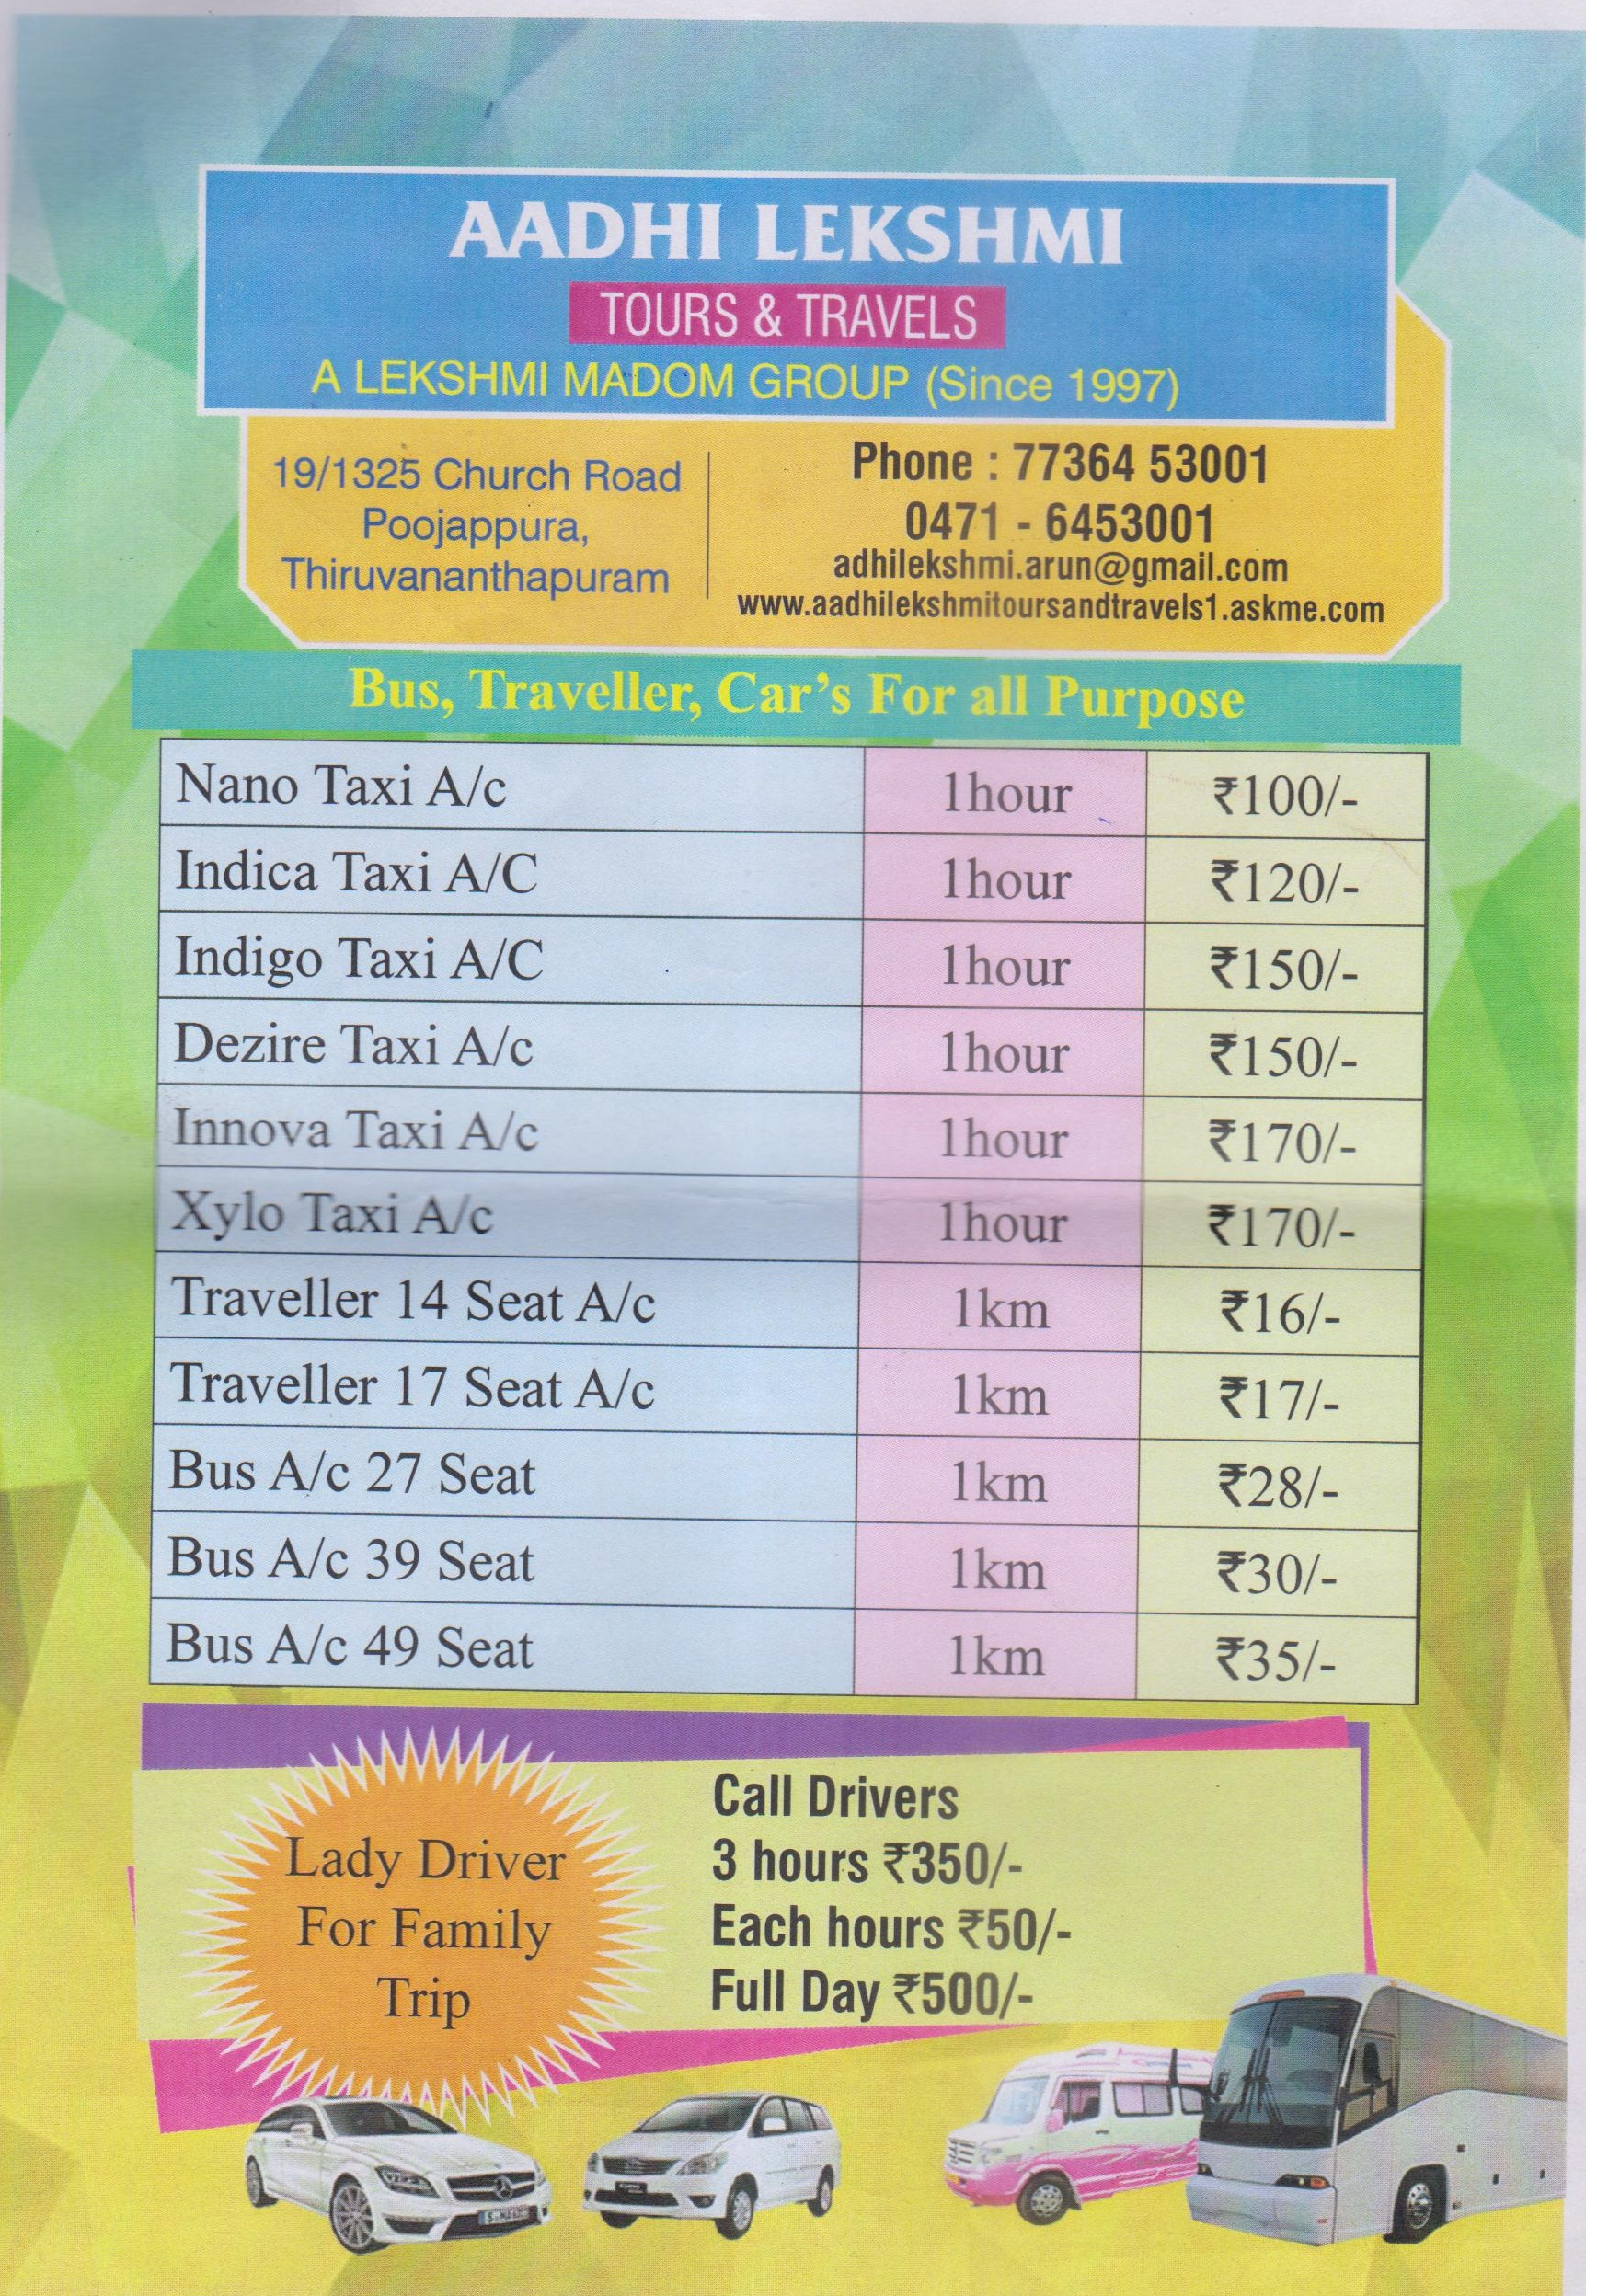 Aadhi Lekshmi Tours and Travels